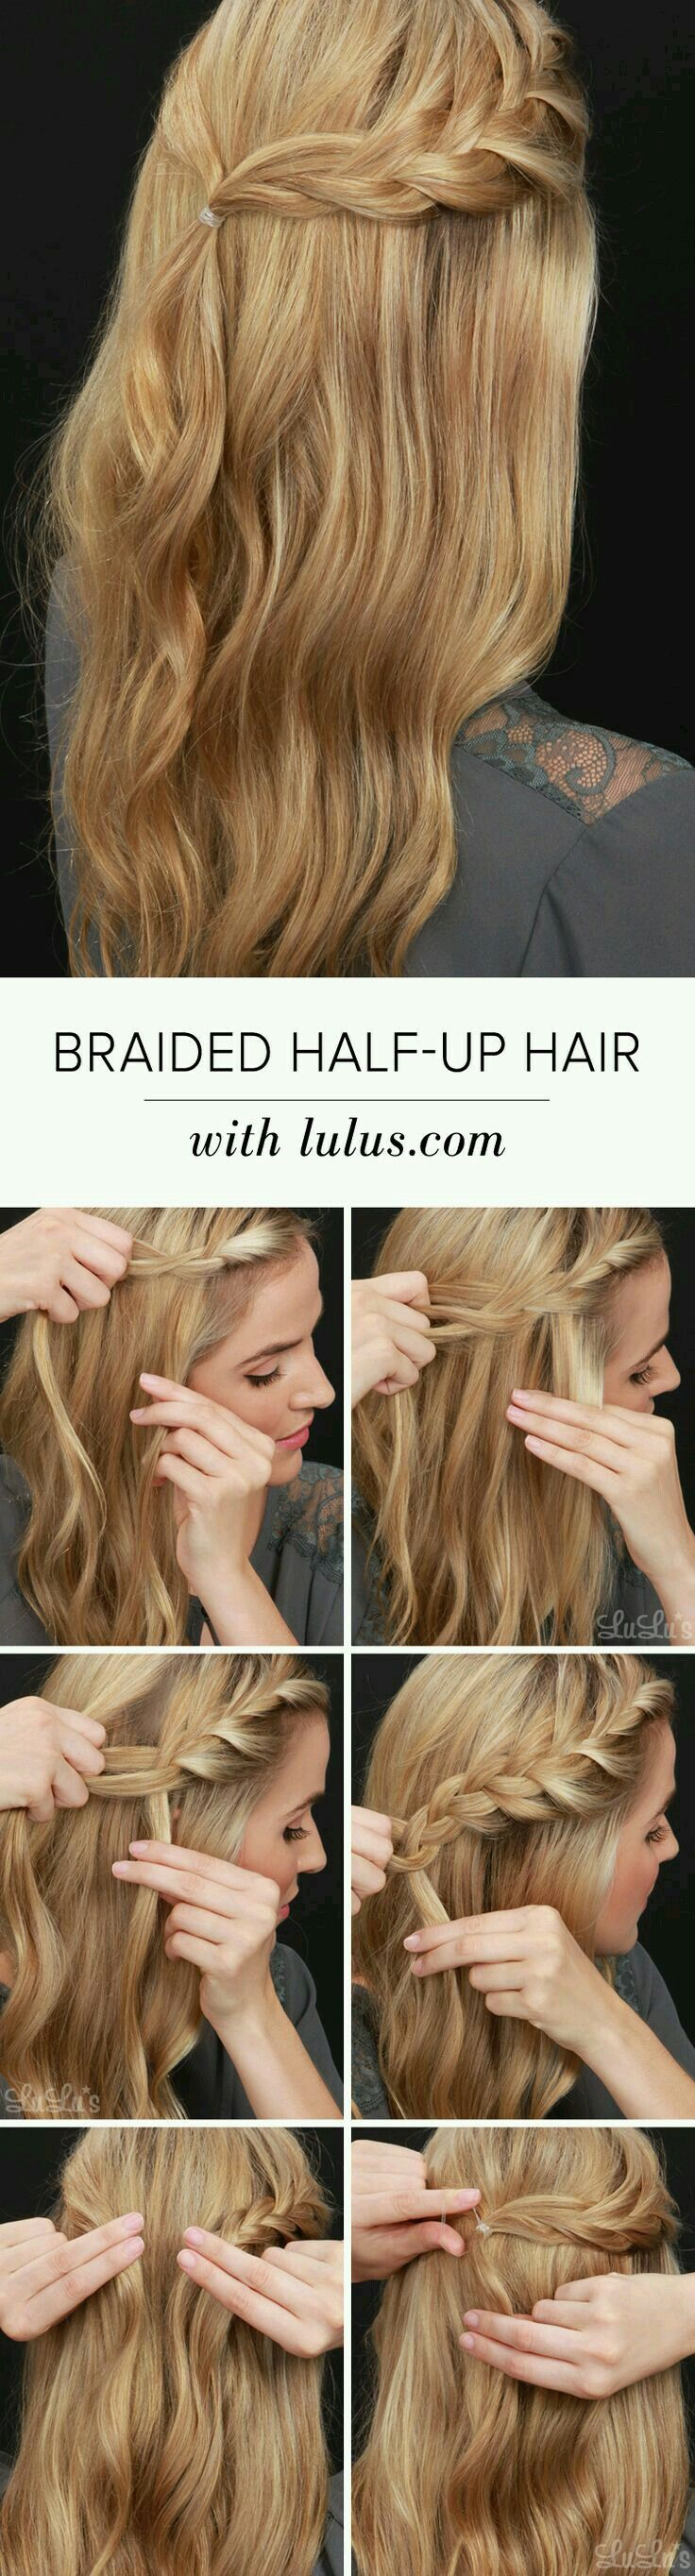 76 best Hair tutorials images on Pinterest